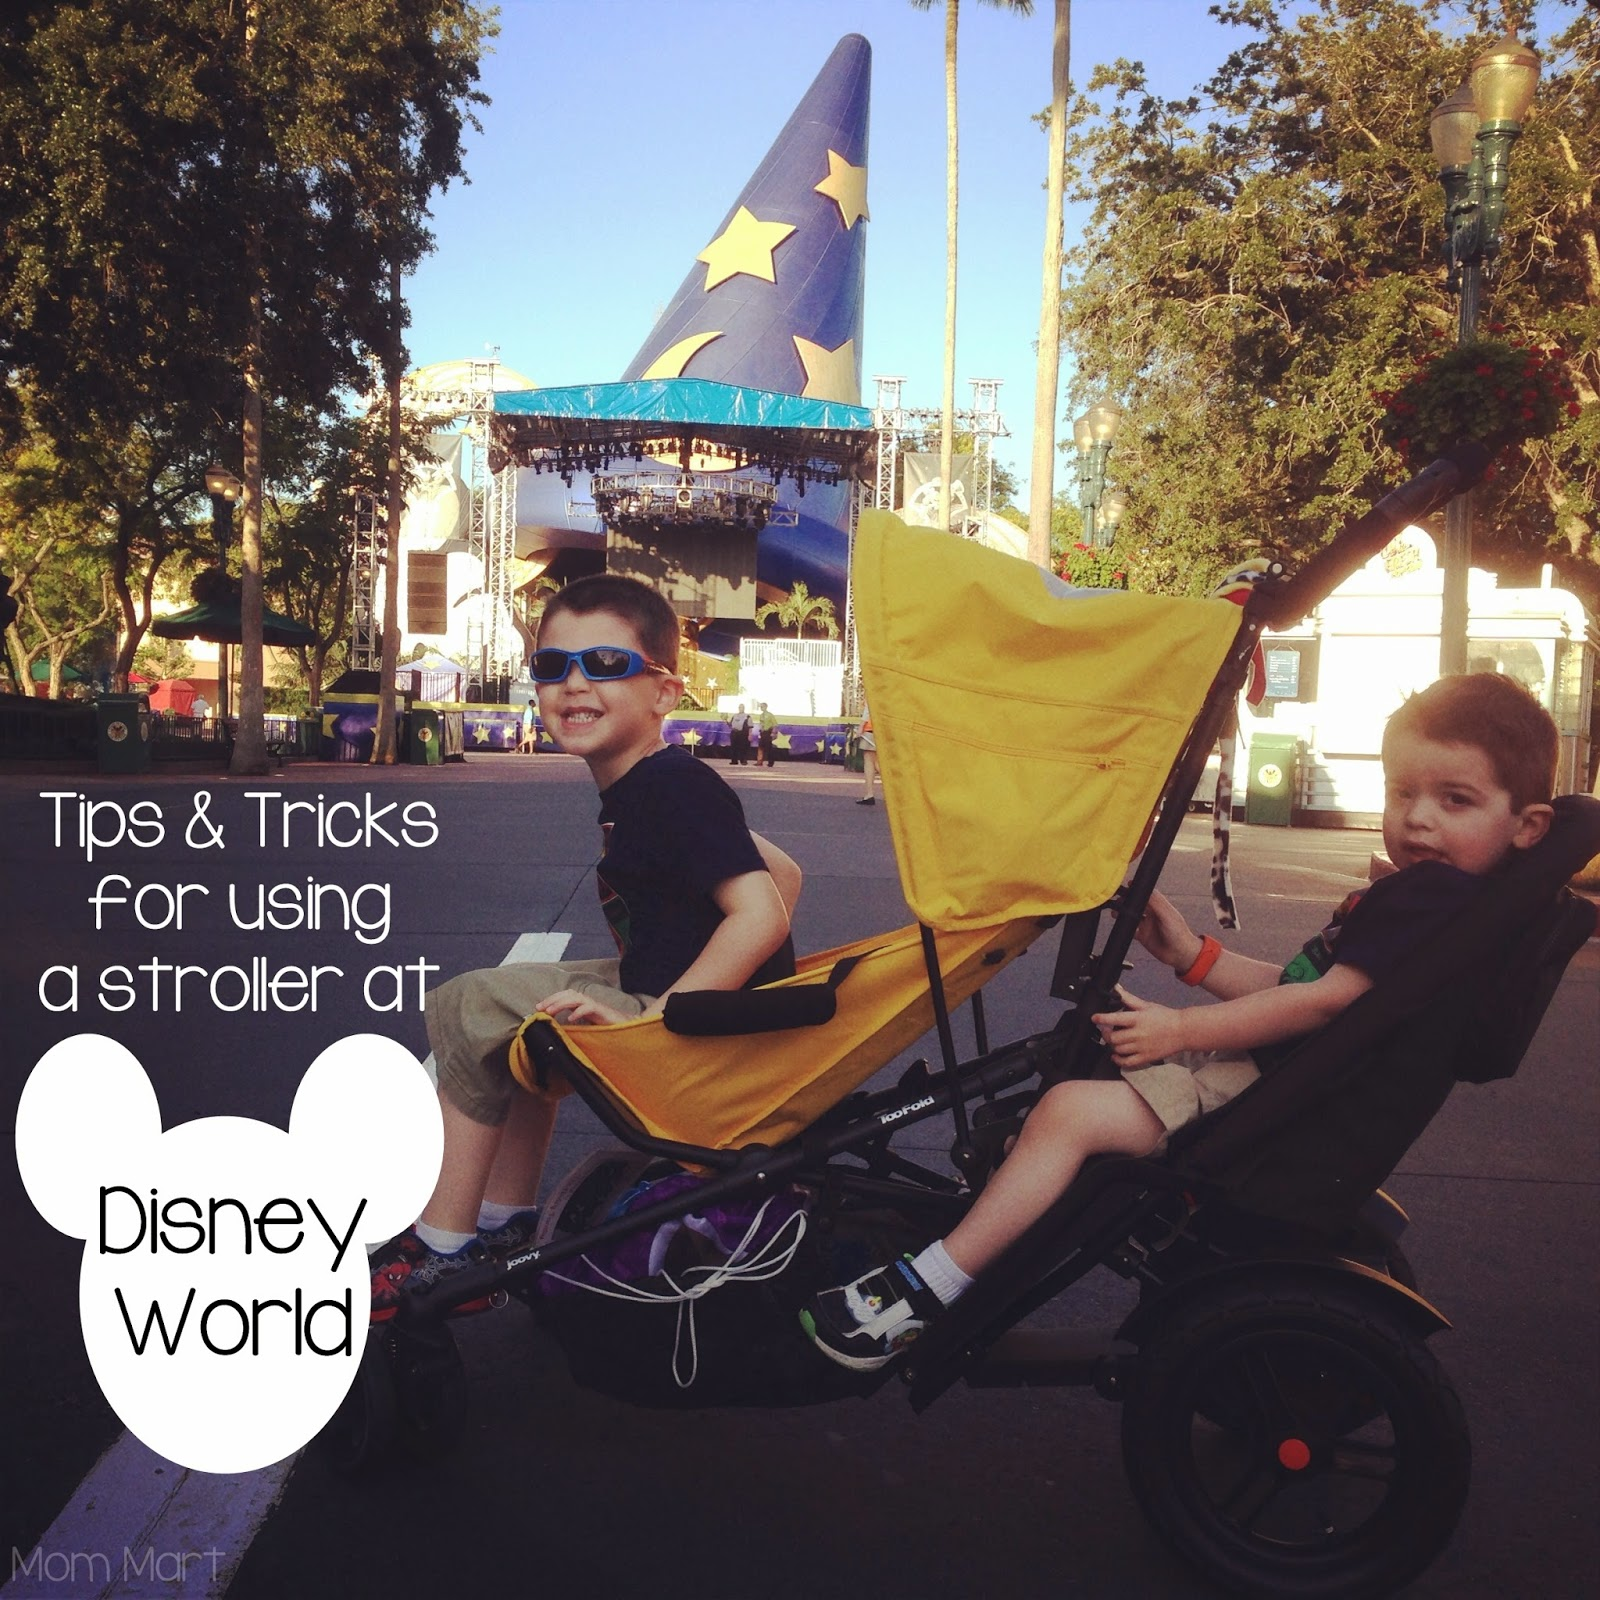 Strollers at Disney World #Disney #Strollers #TipsAndTricks